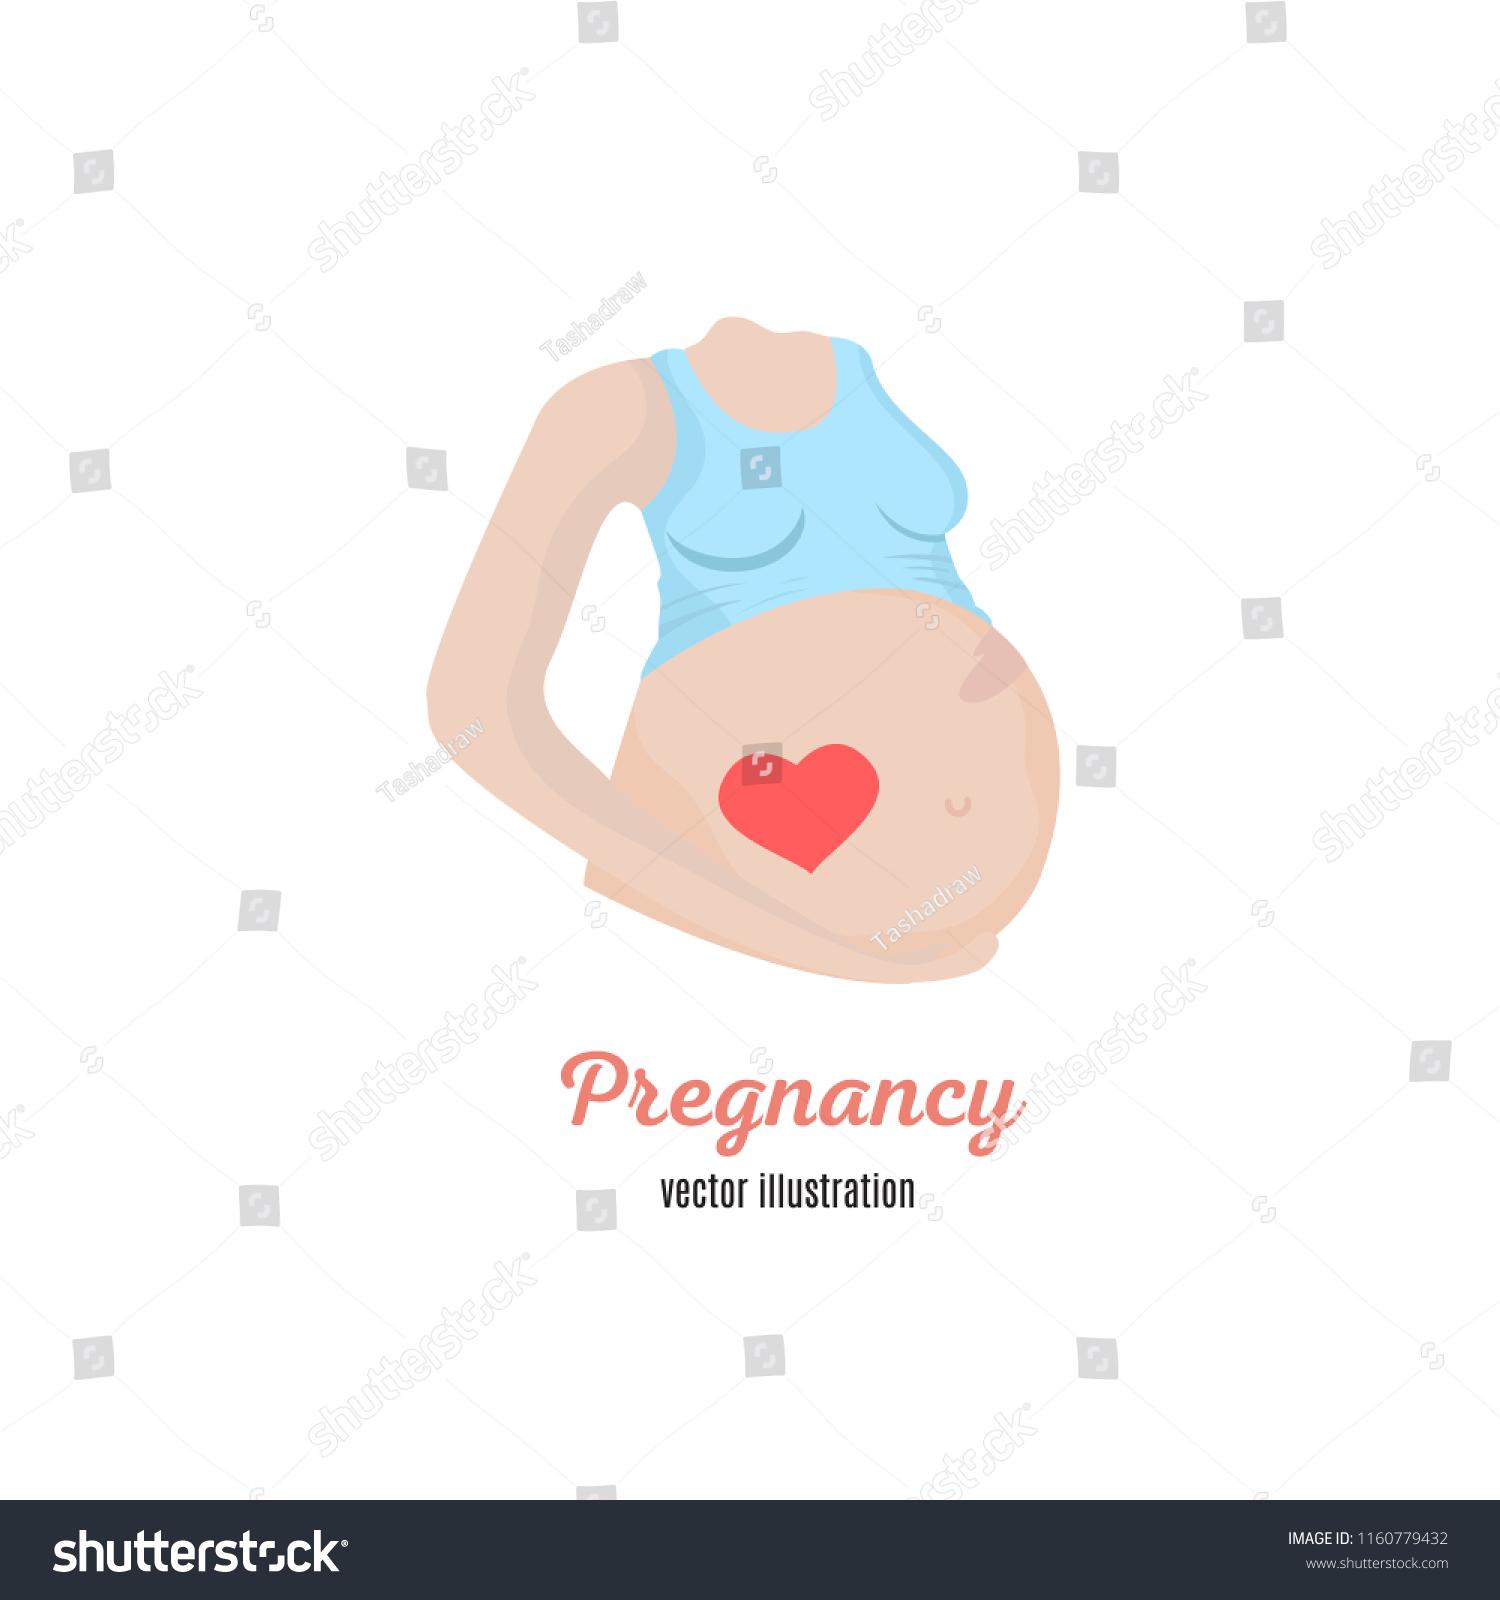 hight resolution of pregnancy woman diagram illustration vector illustration in flat hand drawn line art cartoon